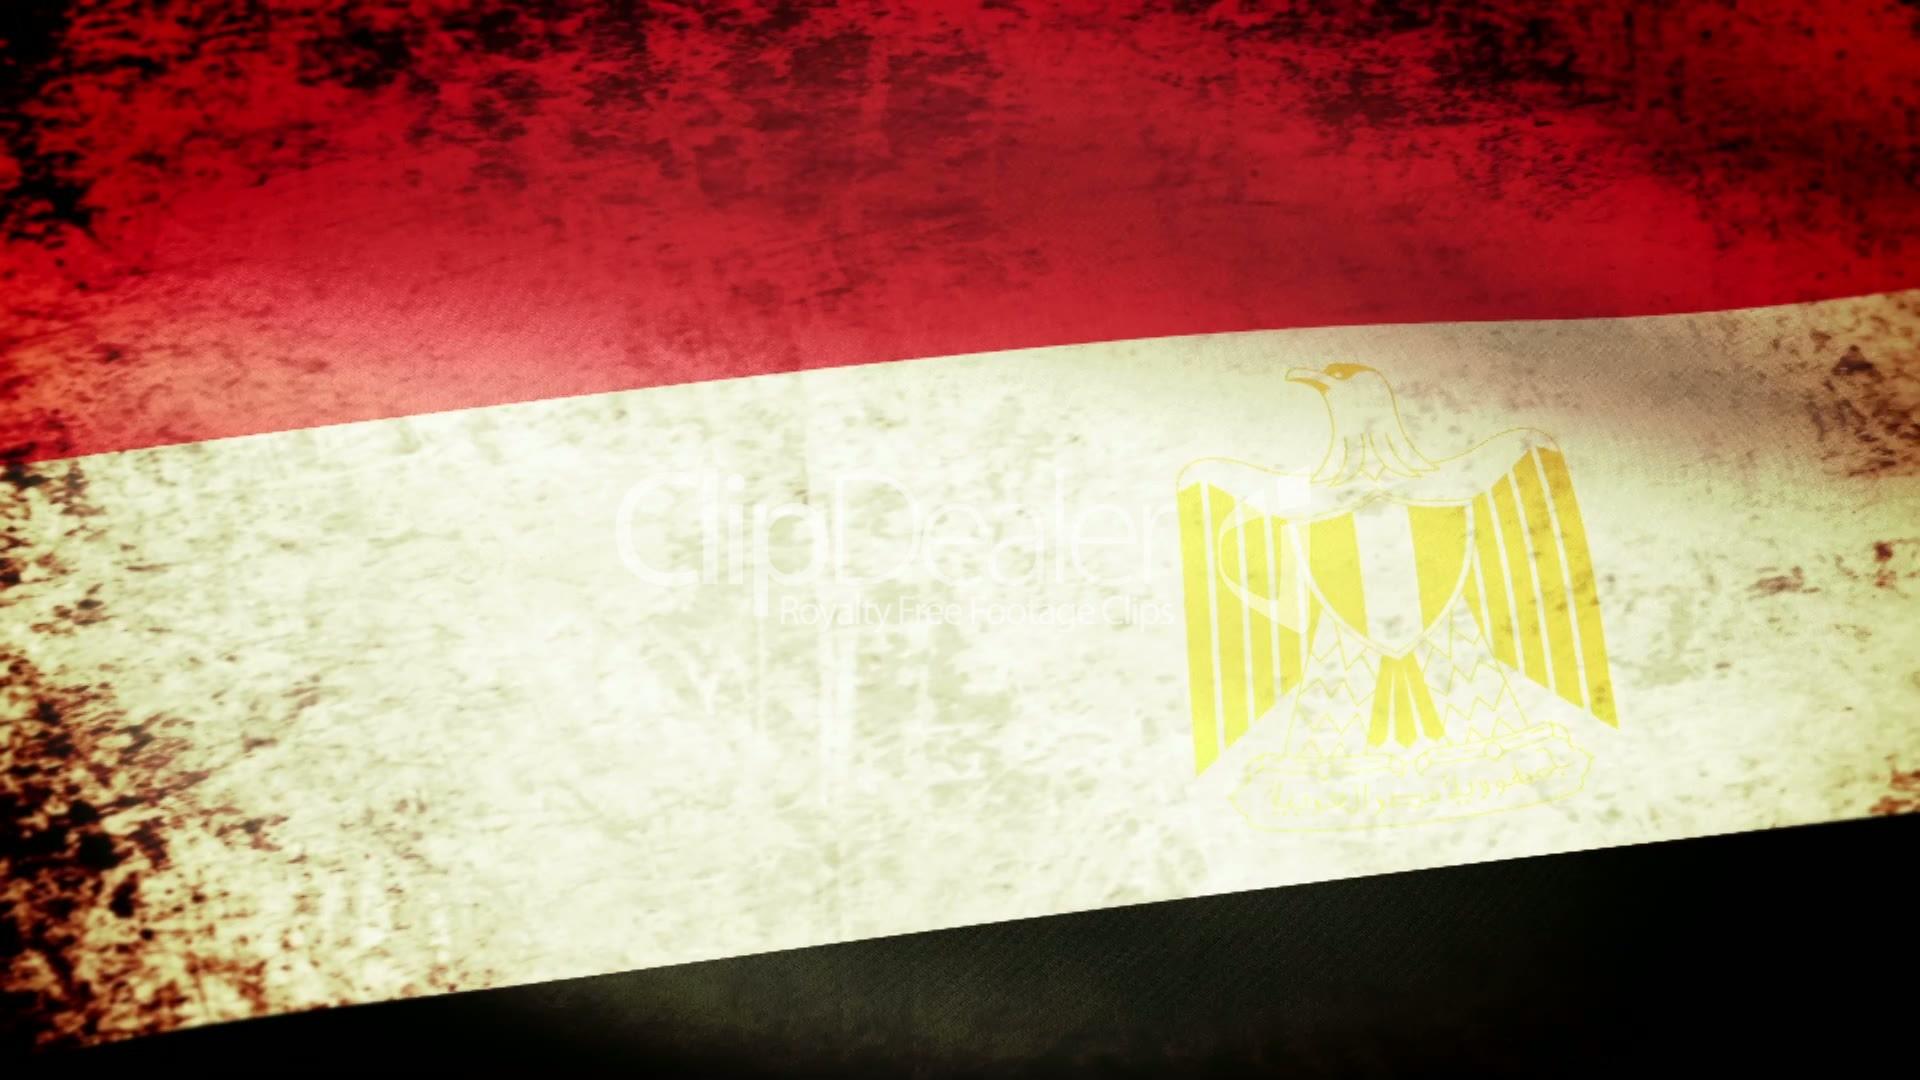 صور علم مصر (5)